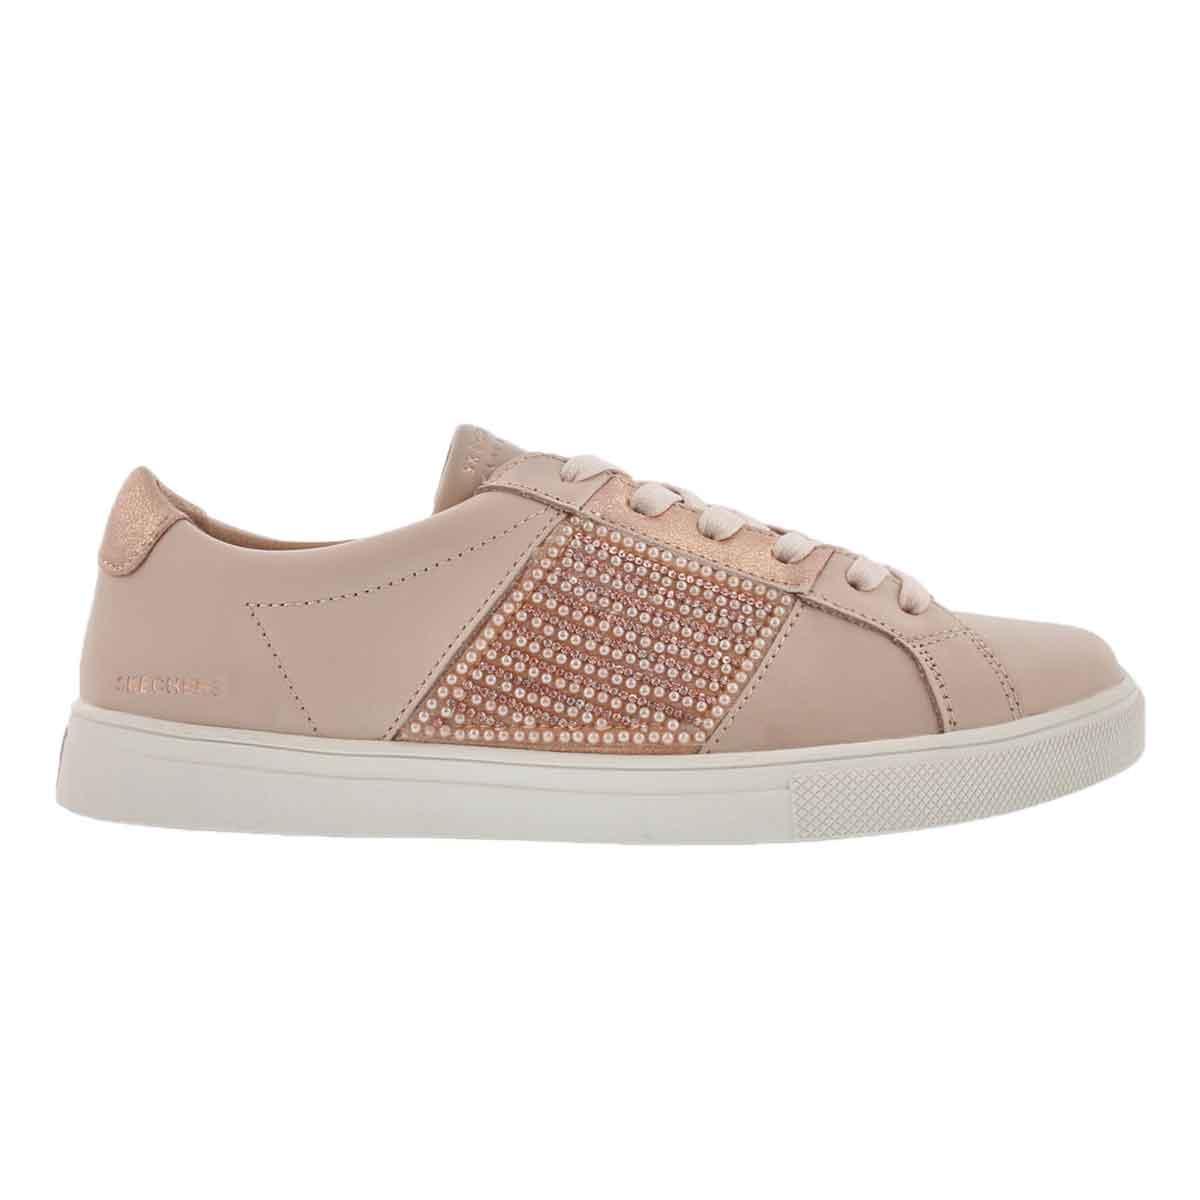 Lds Moda Bling Bandit lt pink sneaker